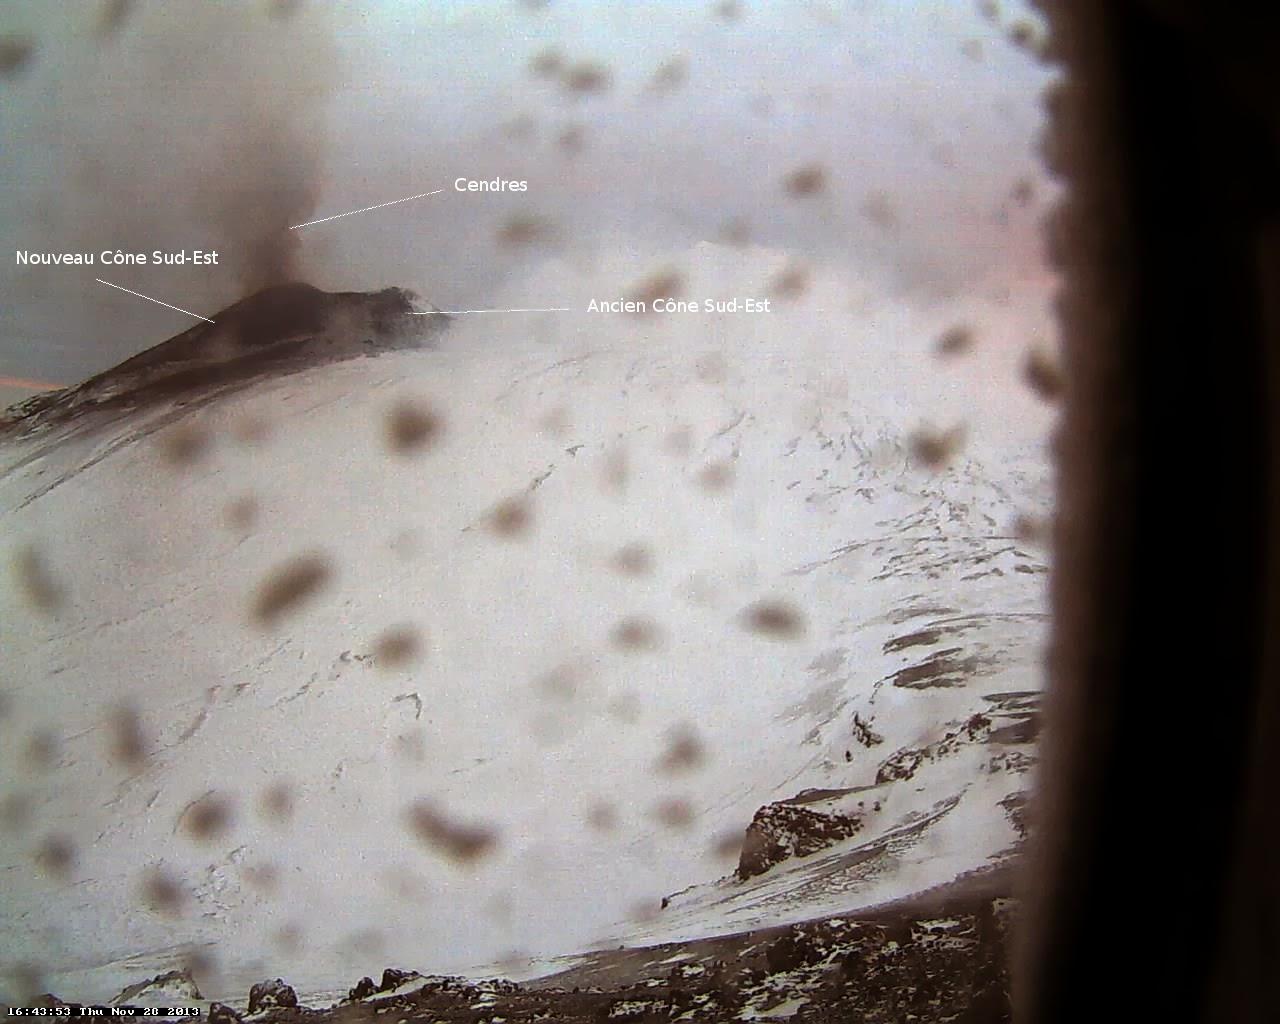 Activité éruptive du volcan Etna, 28 novembre 2013